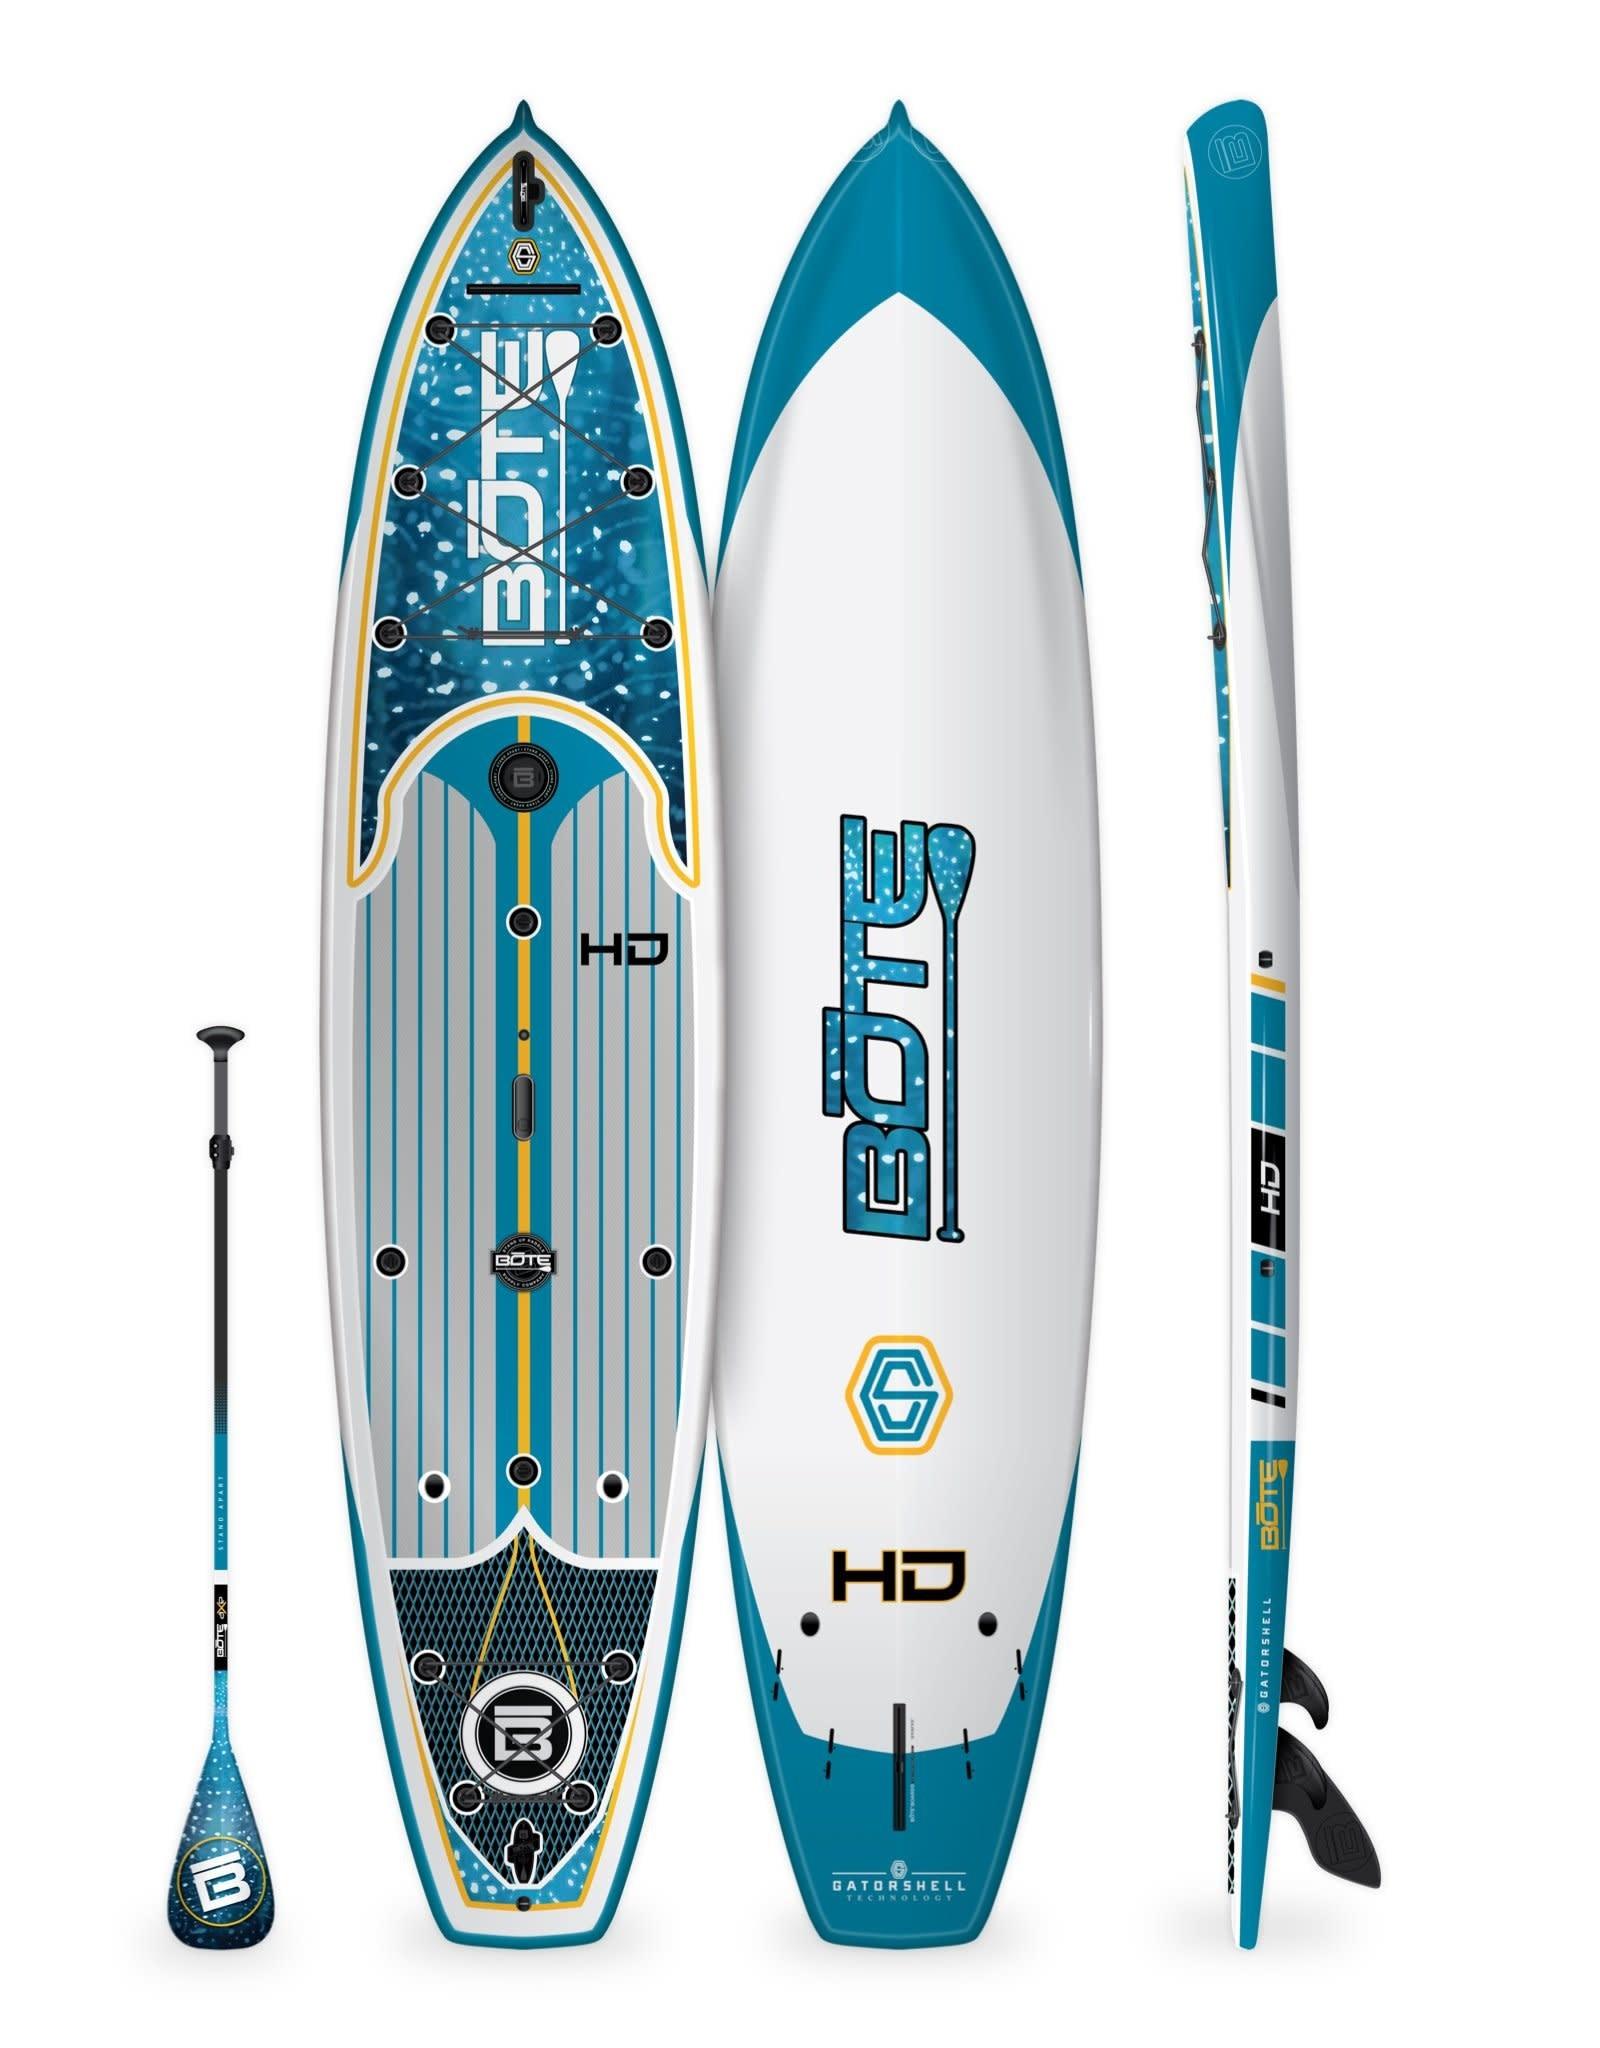 Bote 2021 BOTE 10'6  HD GATORSHELL NATIVE WHALE SHARK